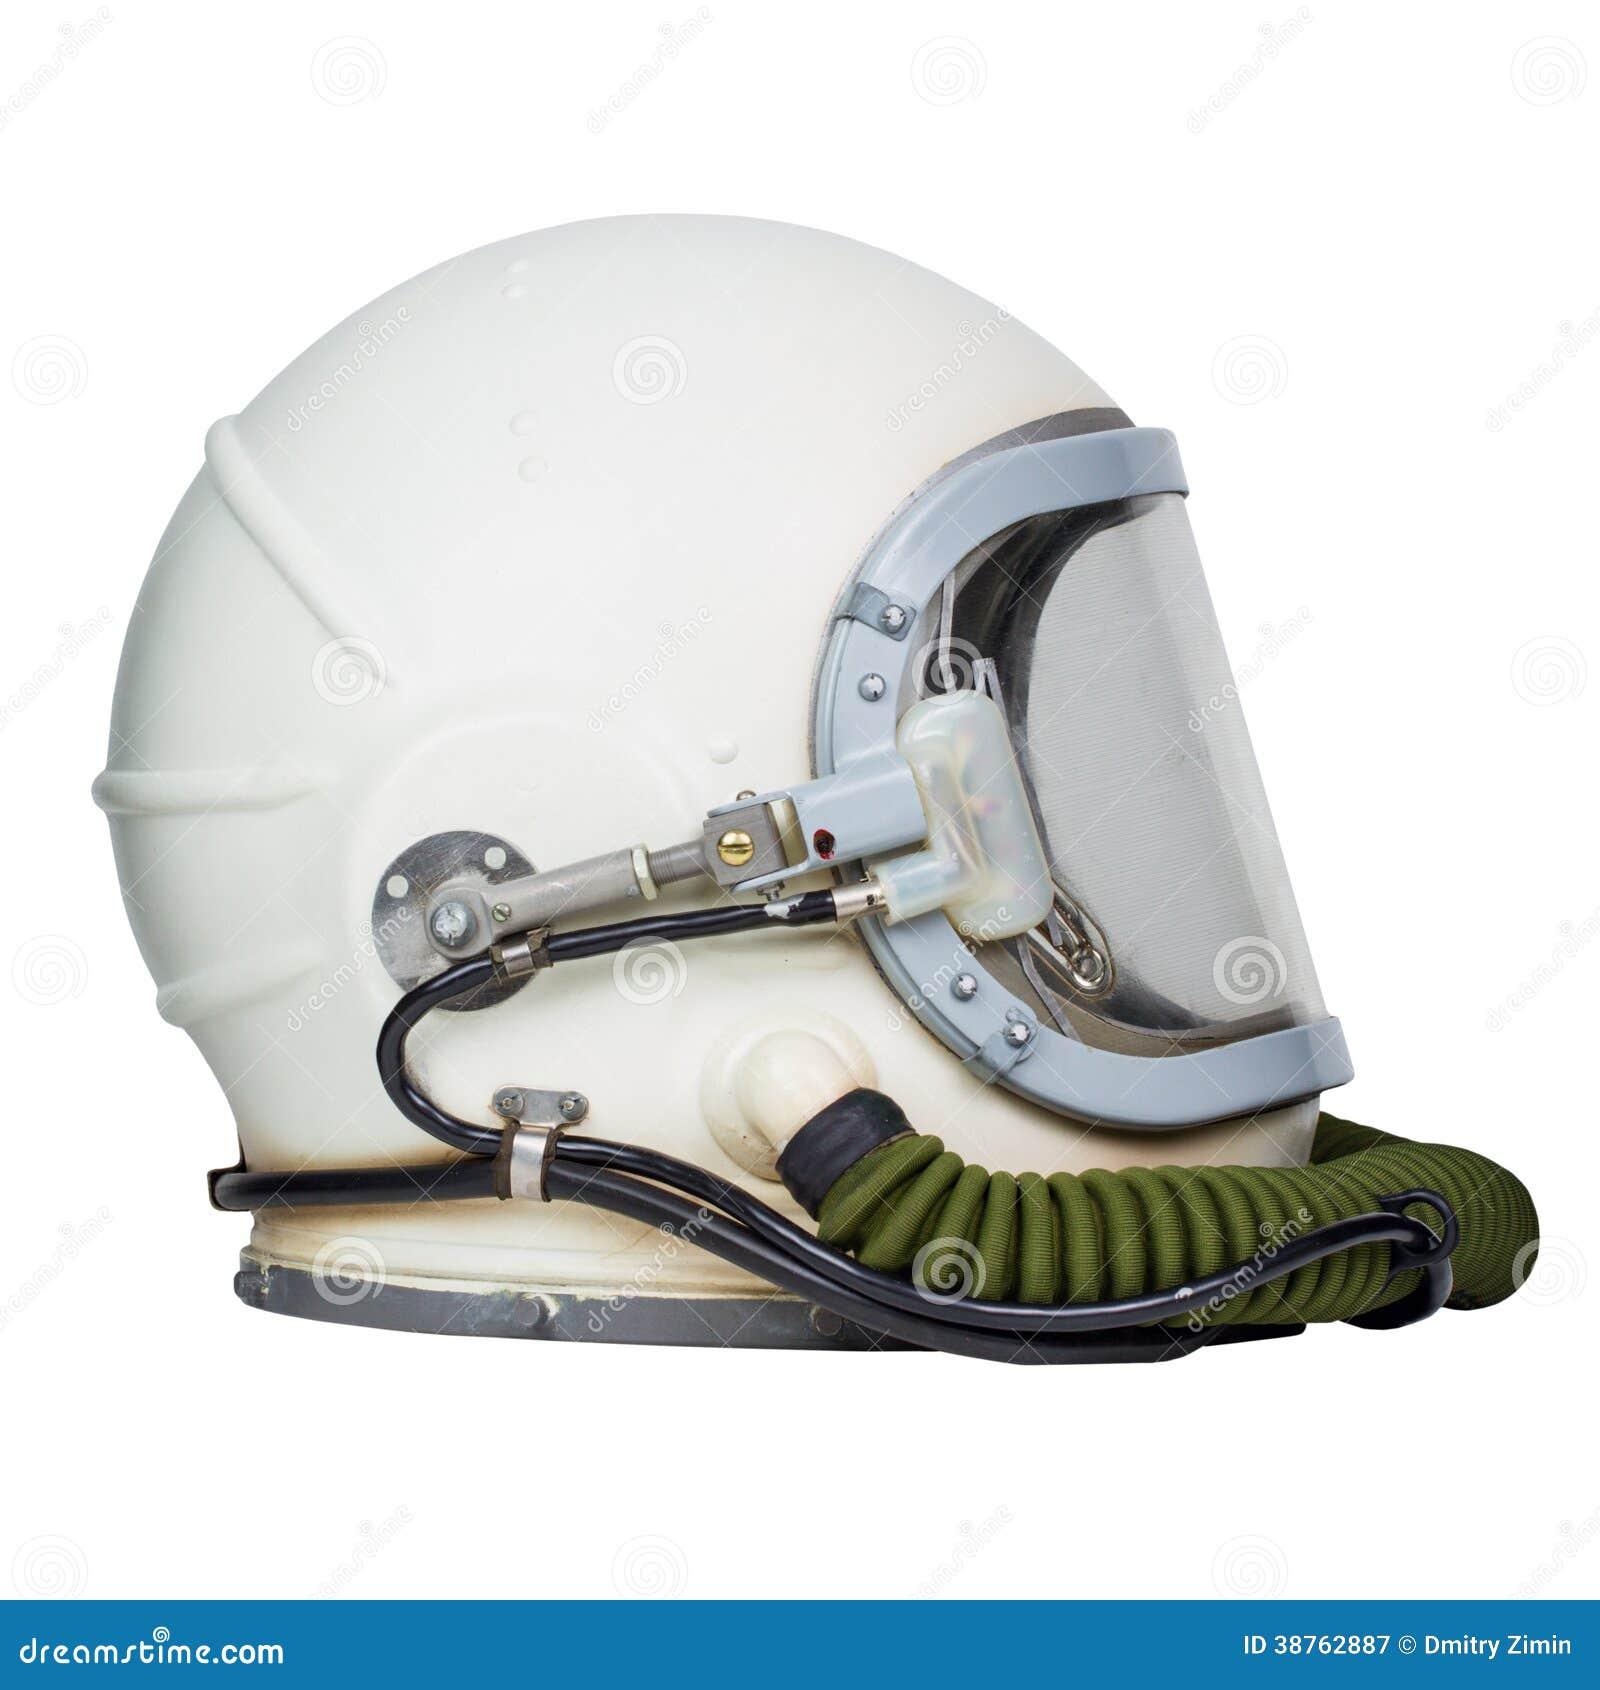 Red Rain Boots Clipart Astronaut's Helmet Roy...